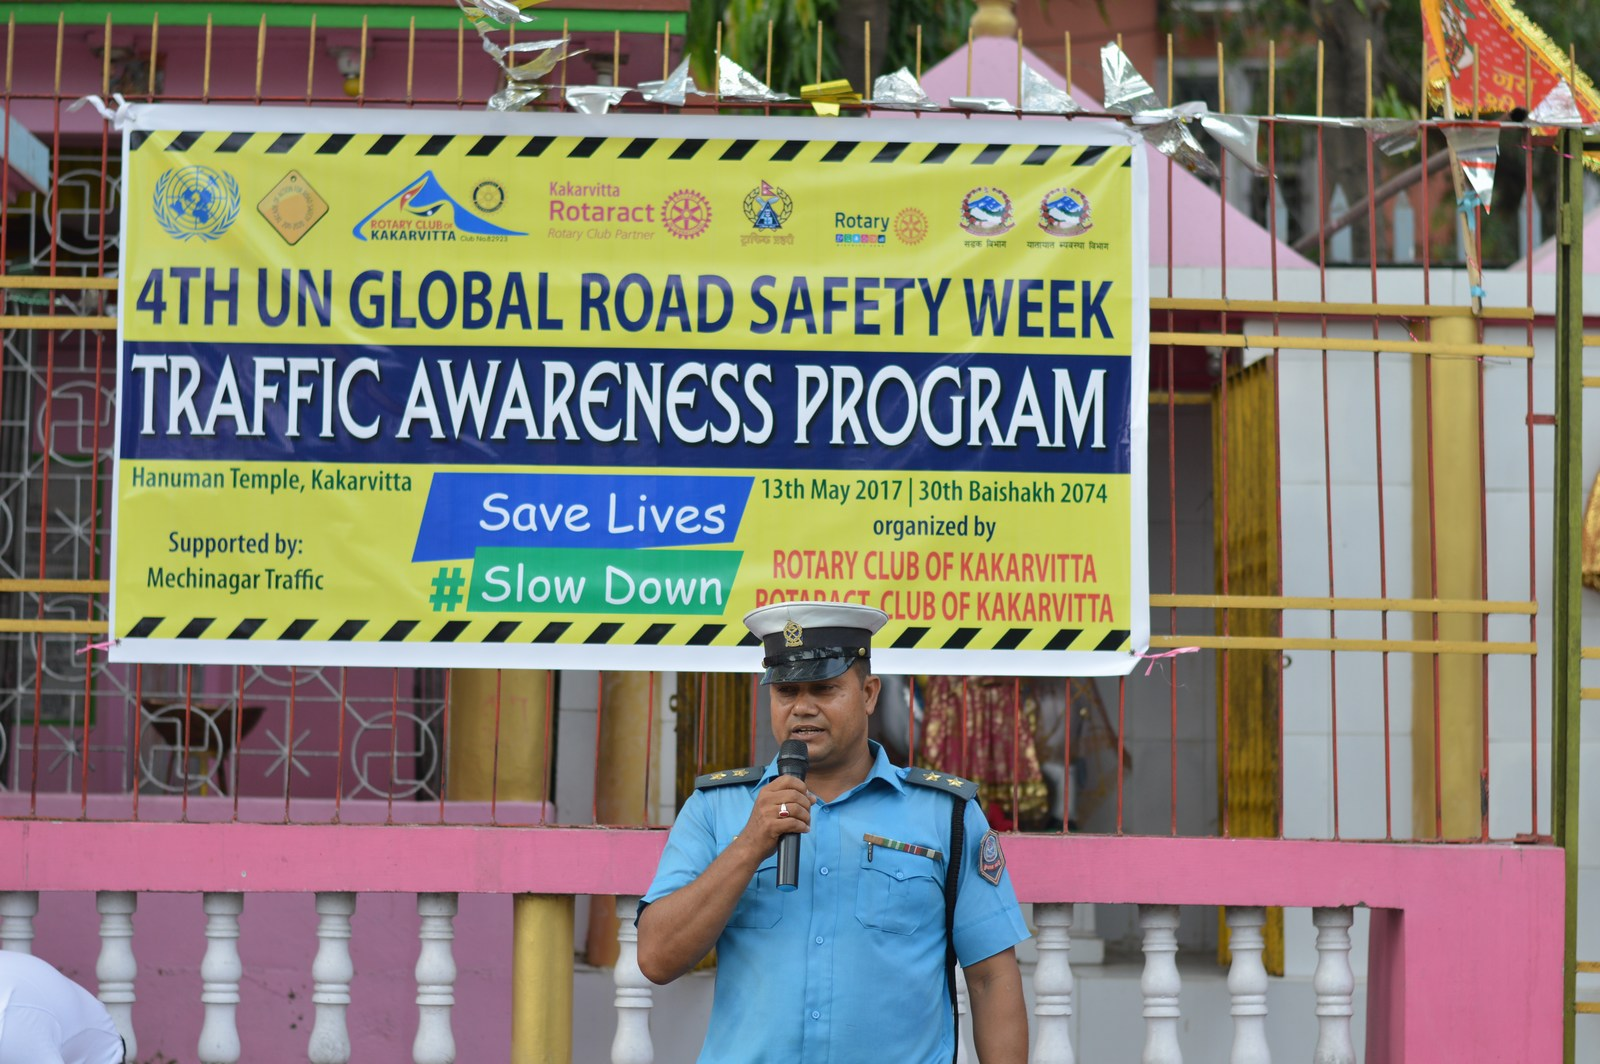 4th-UN-Global-Road-Safety-Week-2017-Traffic-Awareness-Program-Rotary-club-of-Kakarvitta-17